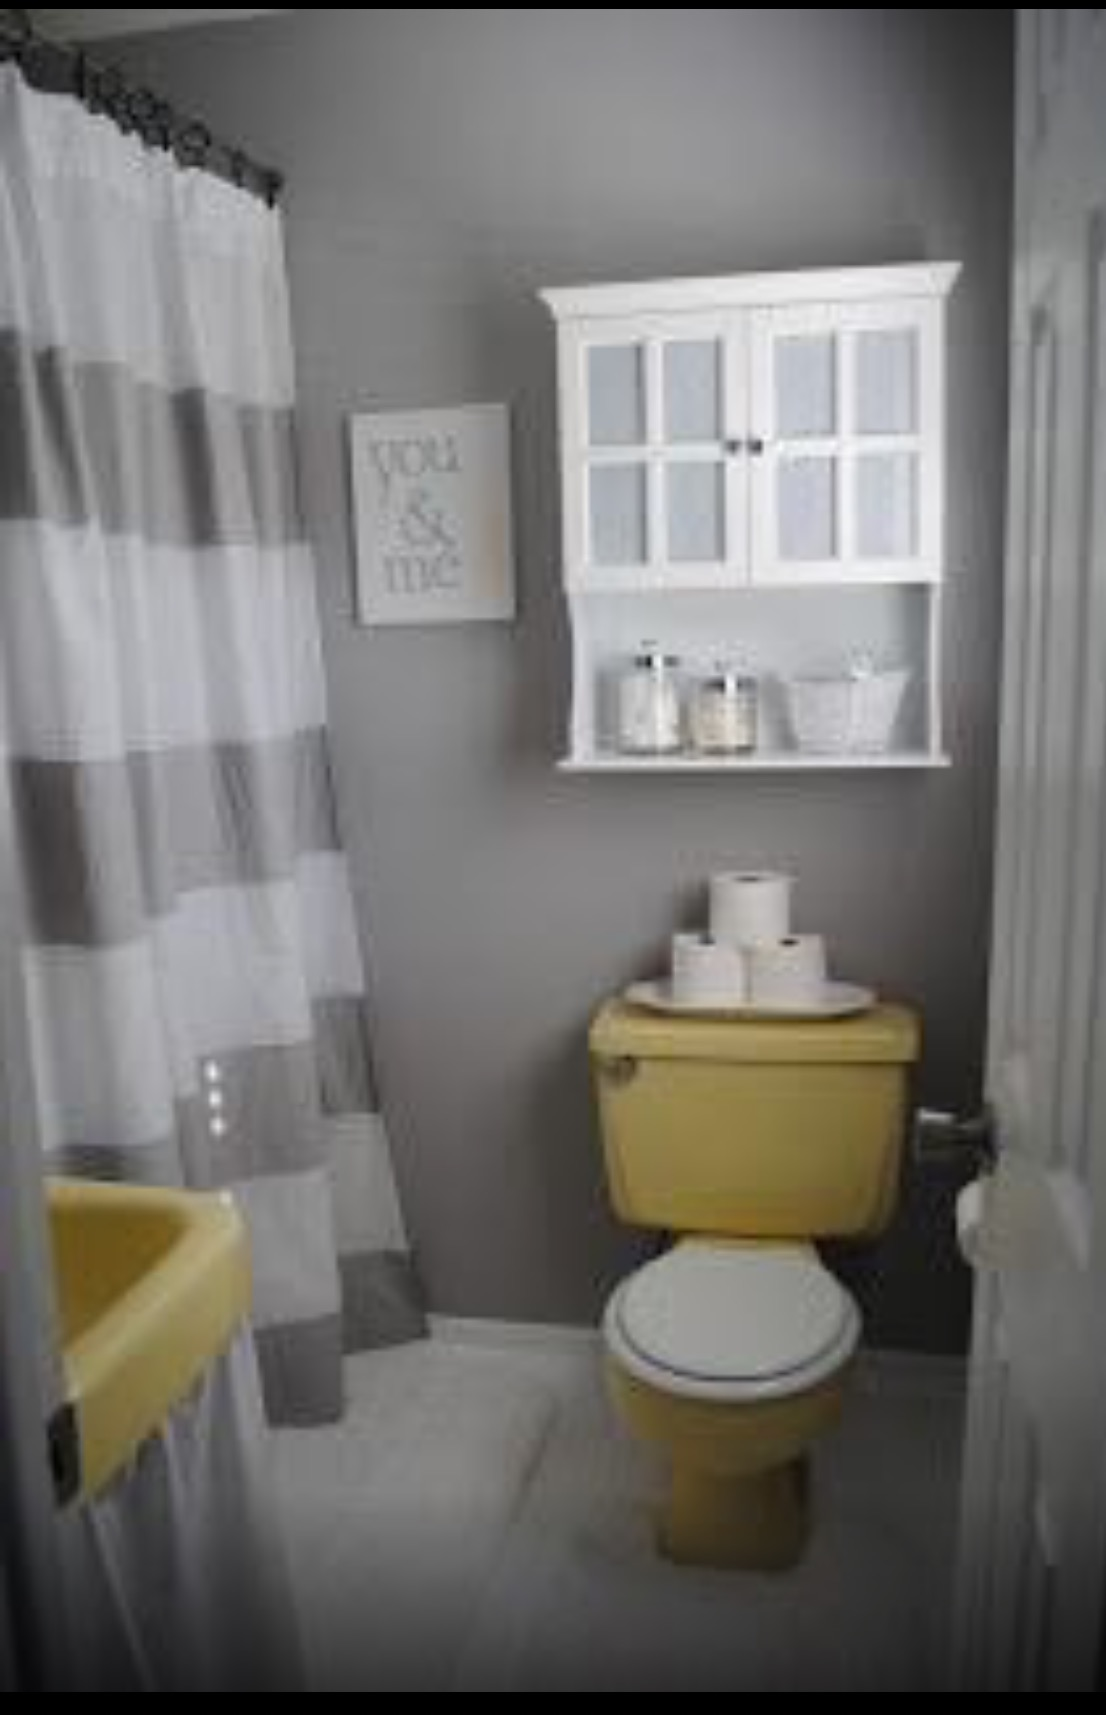 American Standard Yellow Toilet Seat